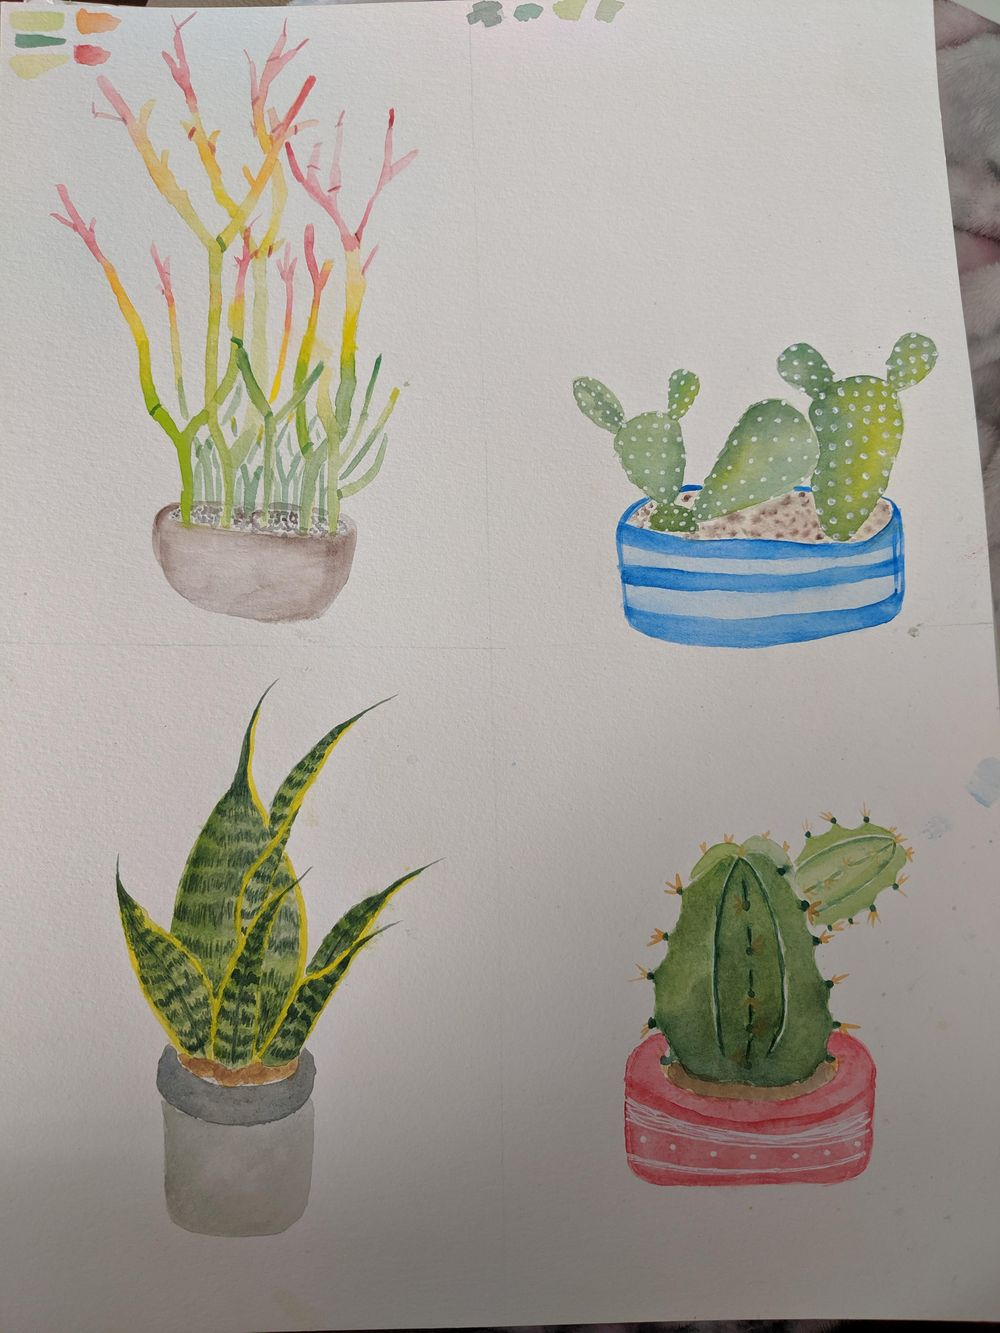 Plants <3 - image 1 - student project